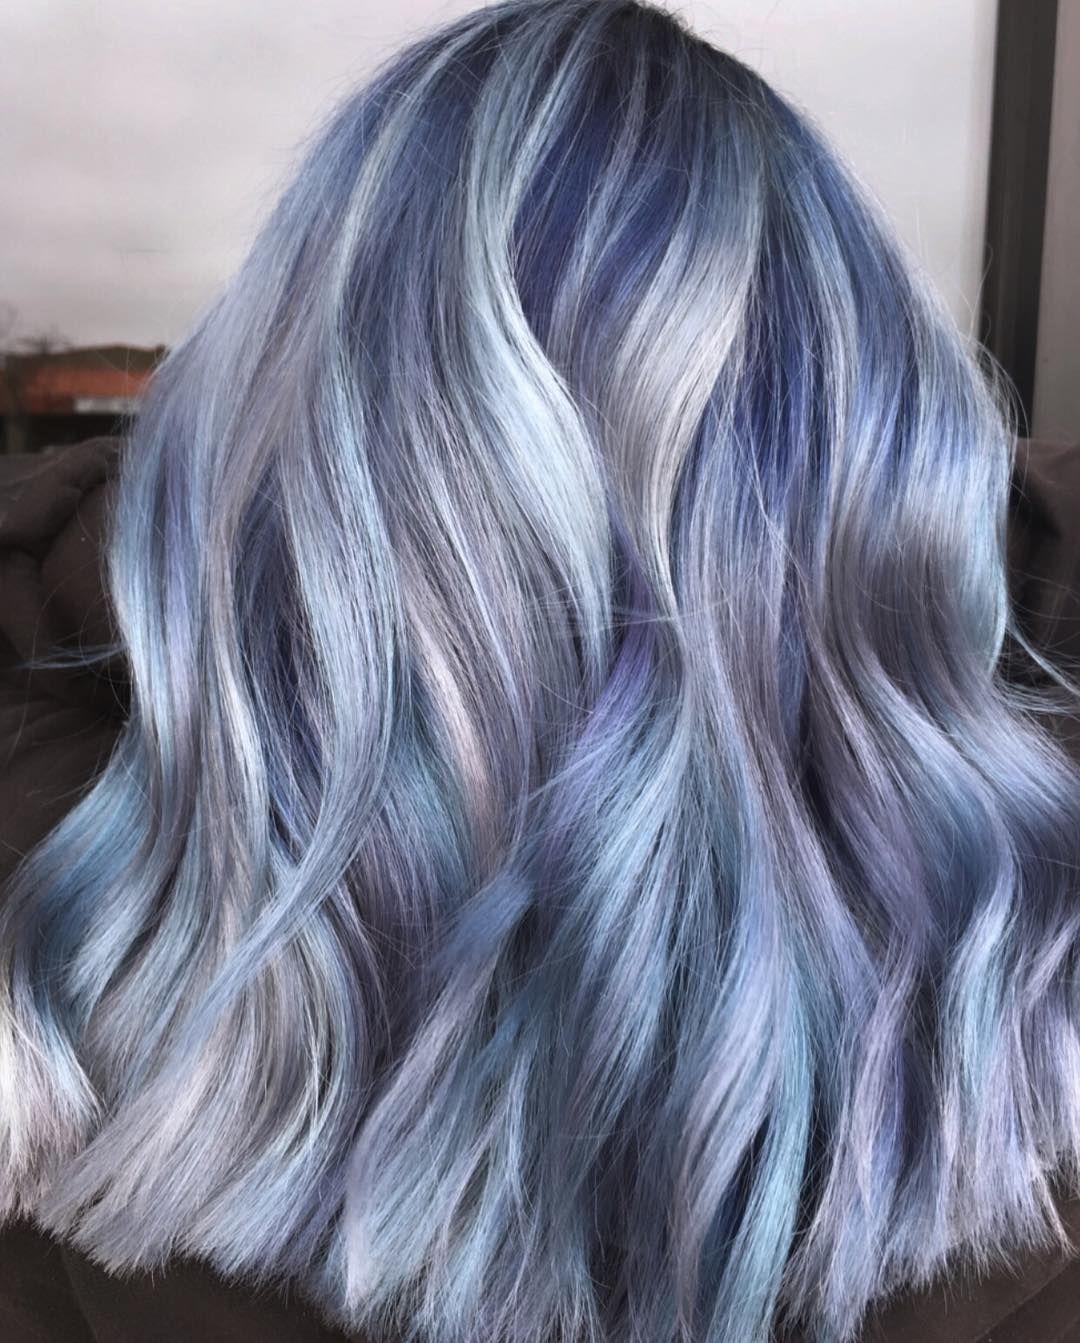 Dimensional Blue Blend By Katie Pa Ints Proformula A